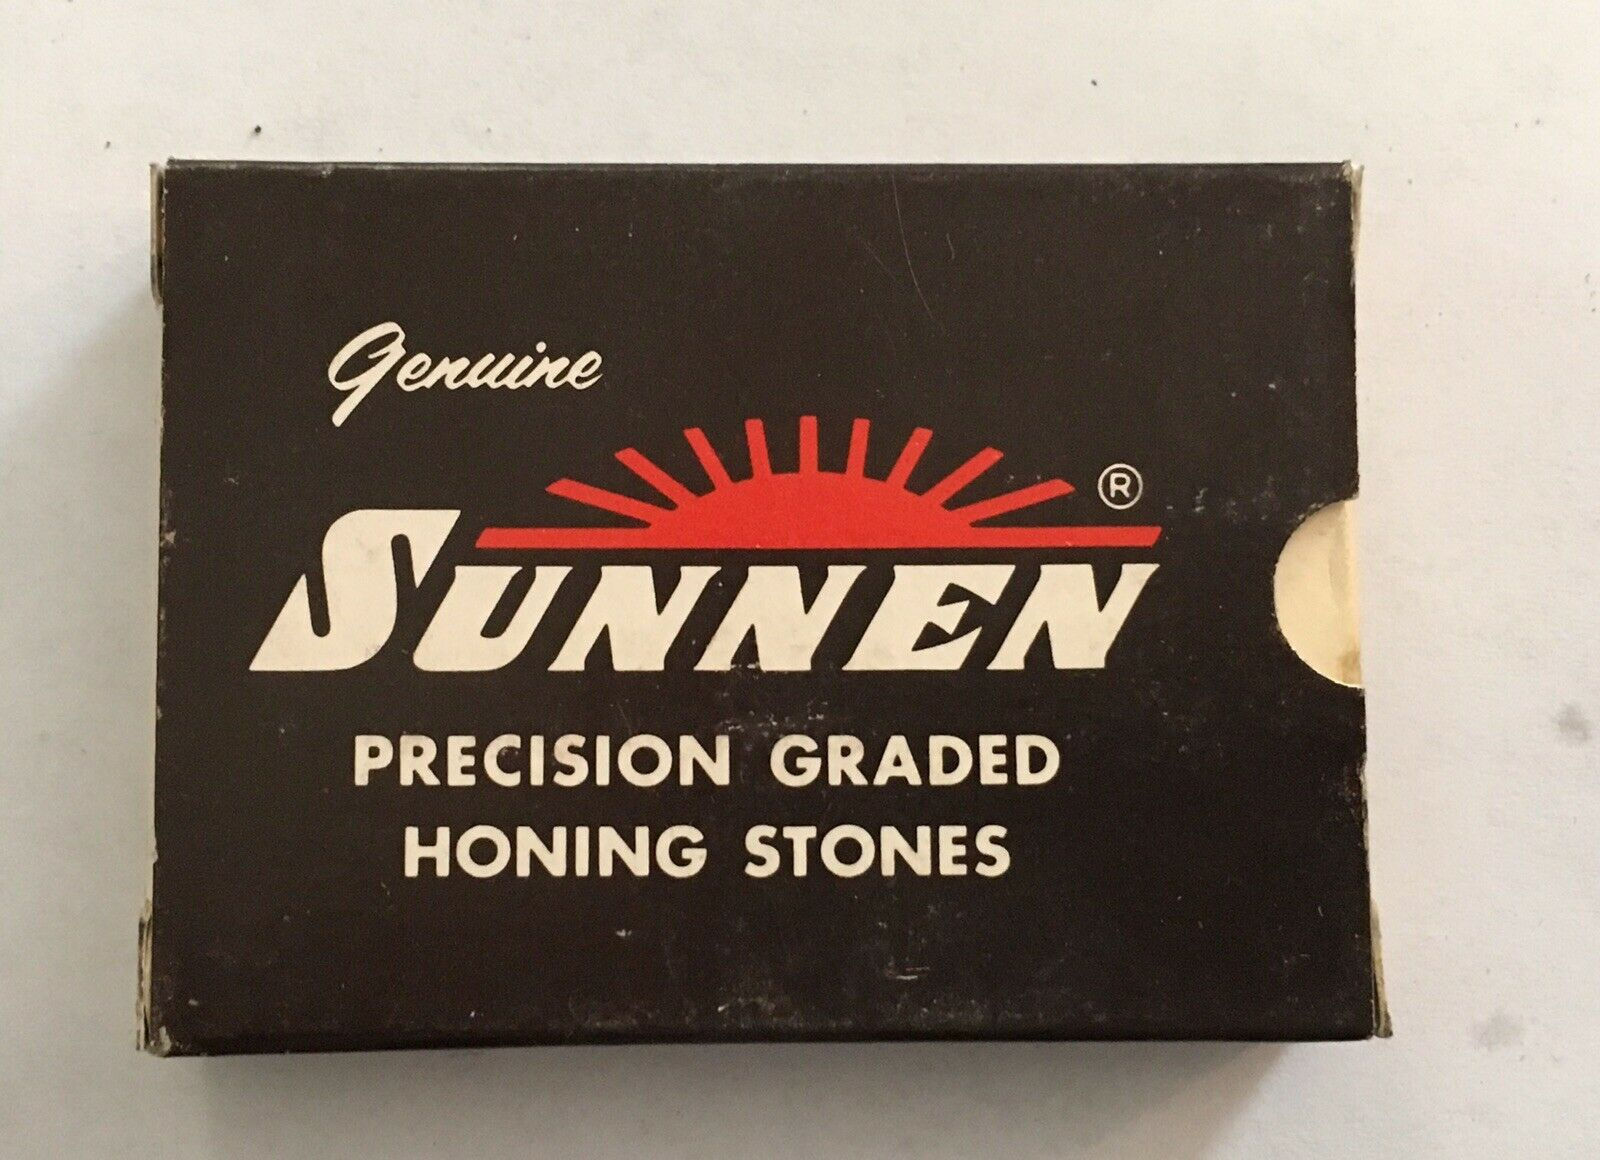 New Sunnen L10-J69 Honing Stones Box Of 6